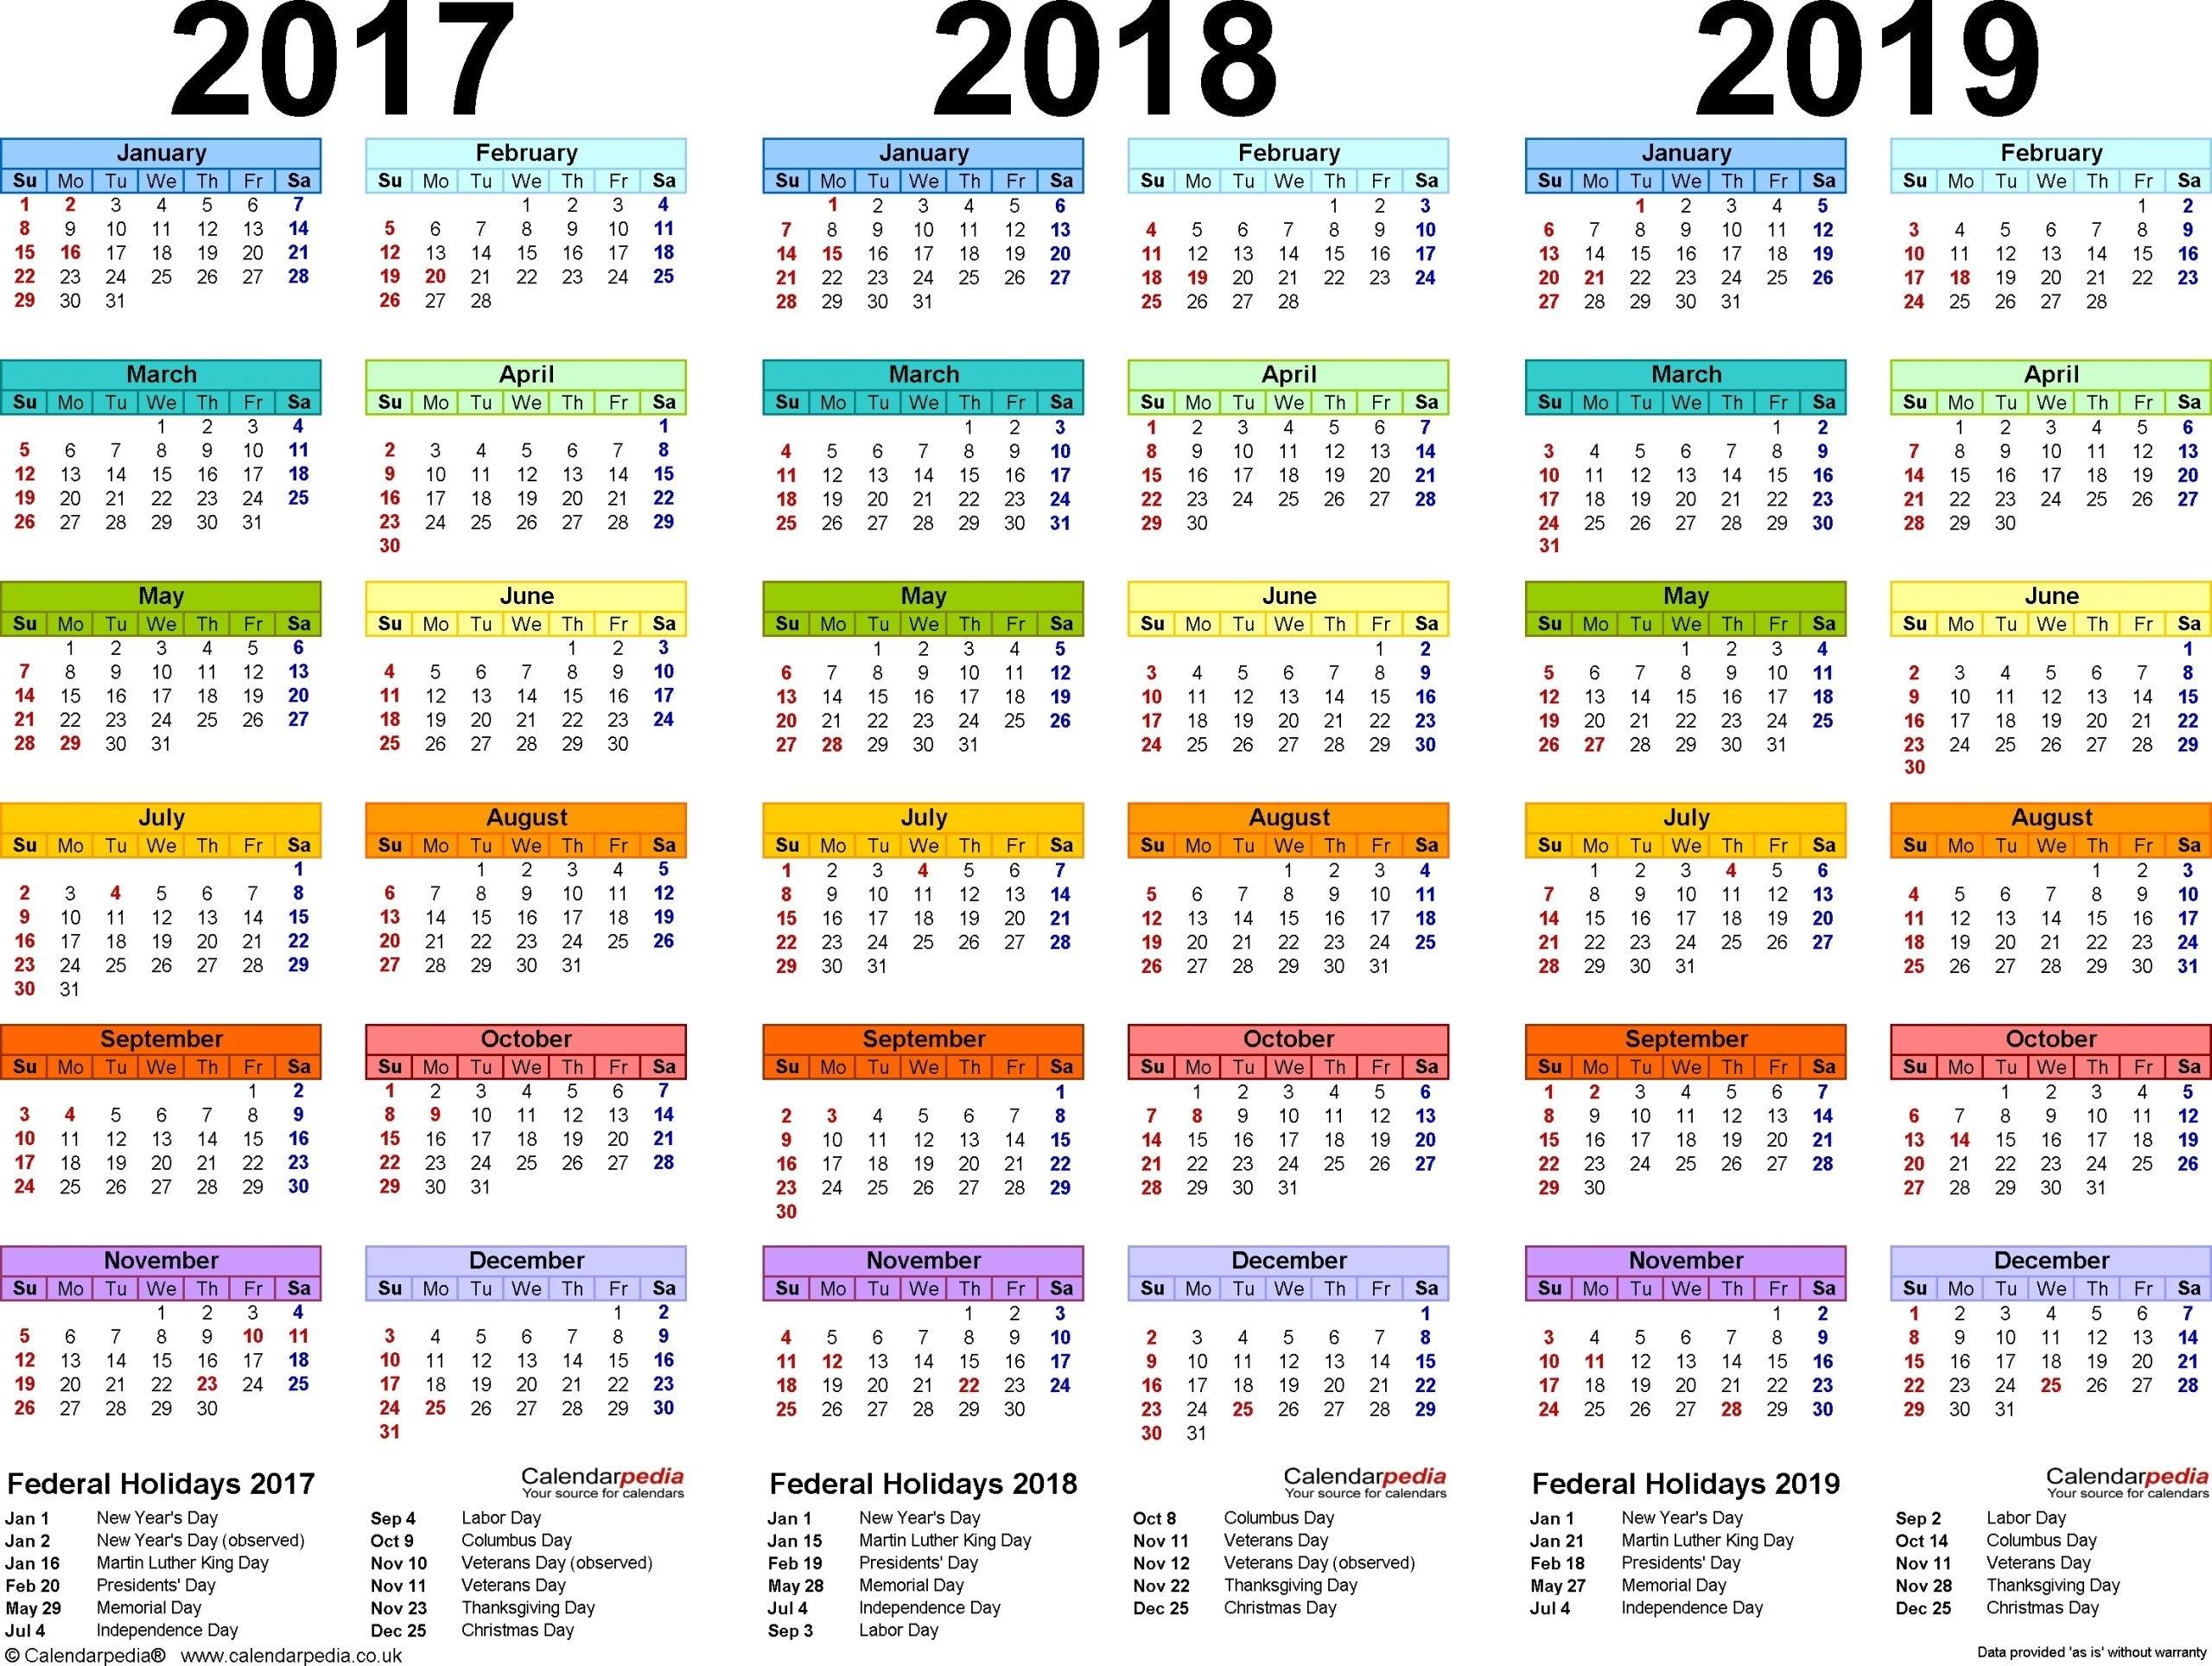 2019 Biweekly Payroll Calendar Template Canada Schedule regarding 2020 Federal Pay Period Calendar Printable